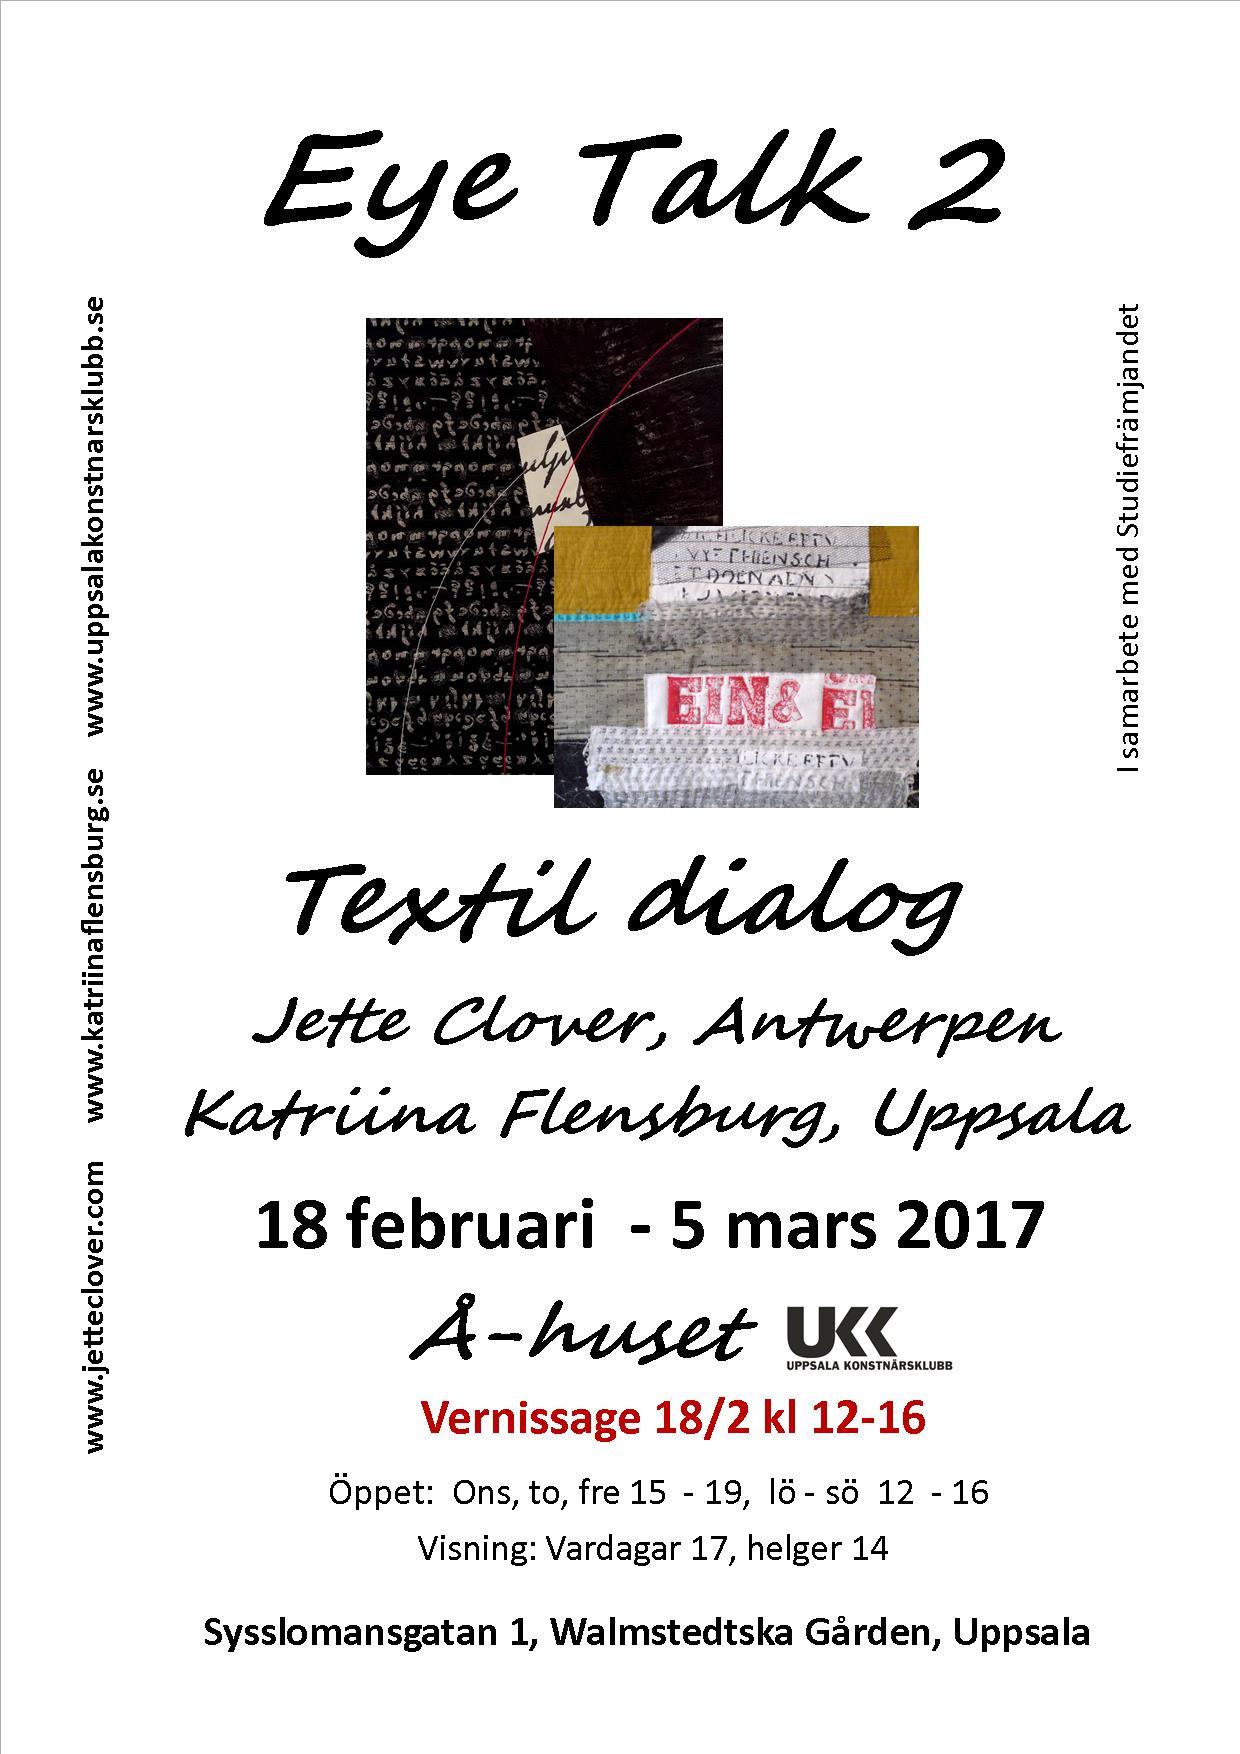 eye-talk-2-poster_invitation-a4-swedish